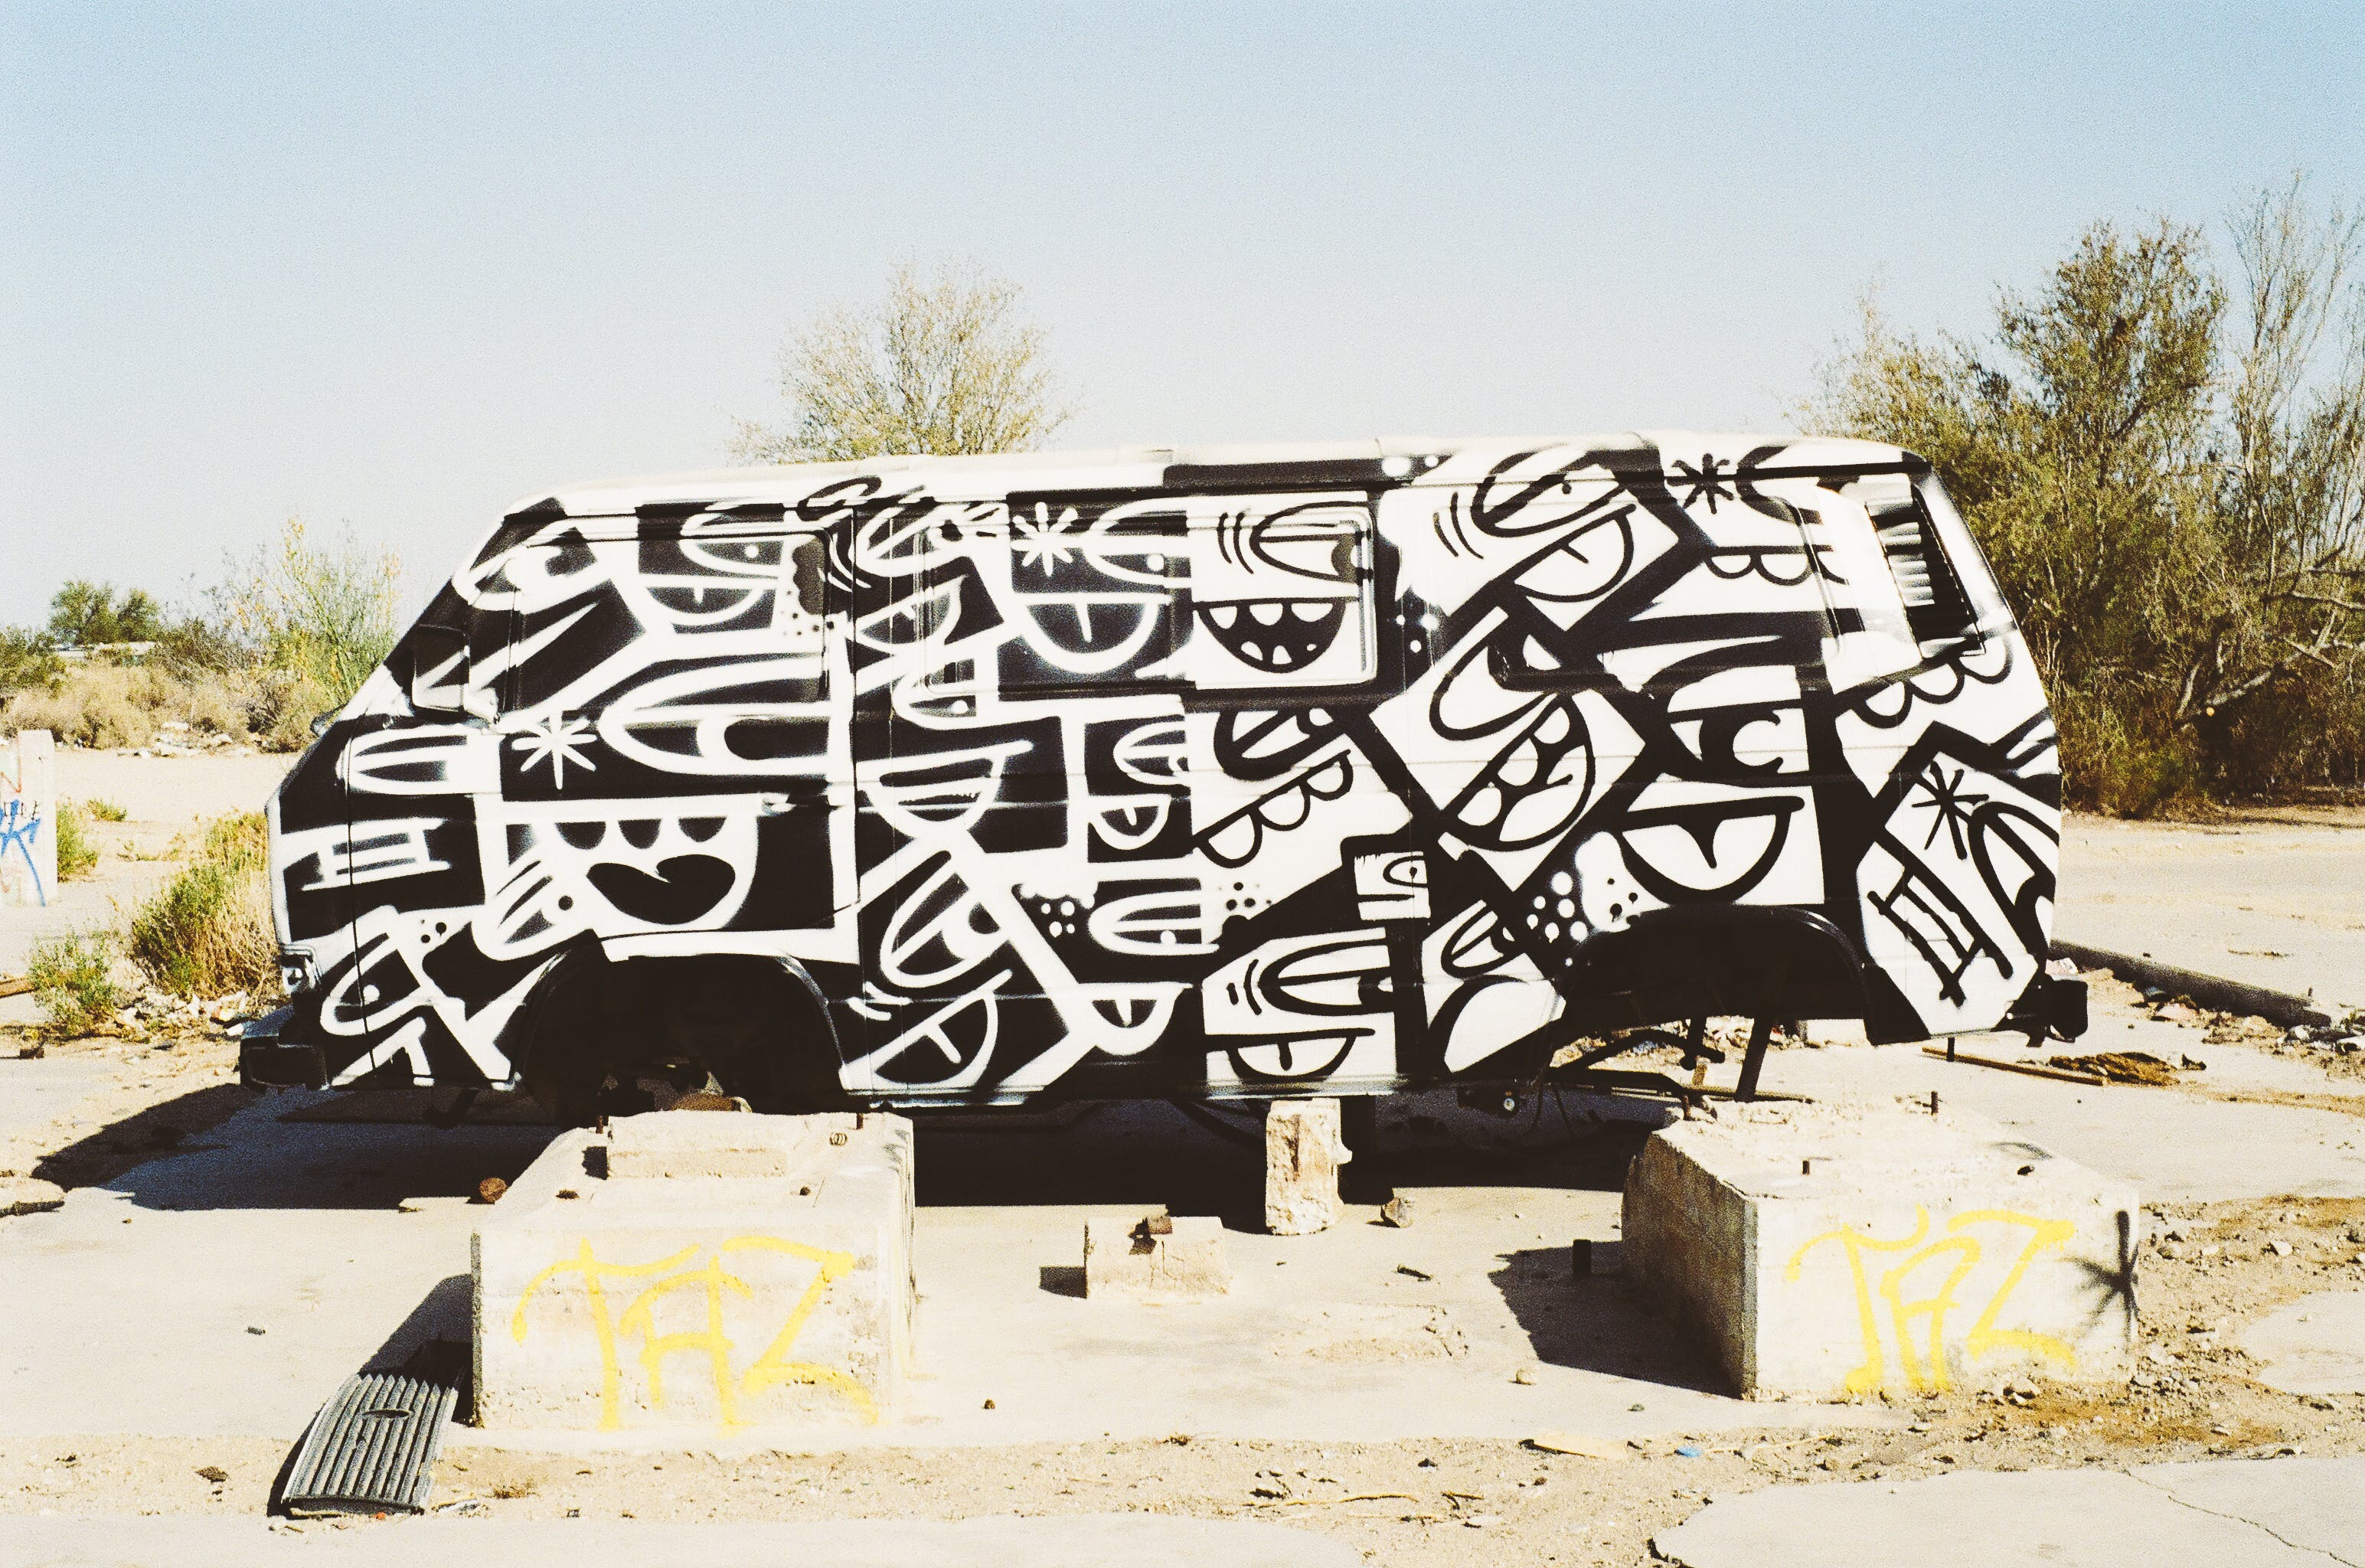 Free stock photo of graffiti, car, vehicle, bus